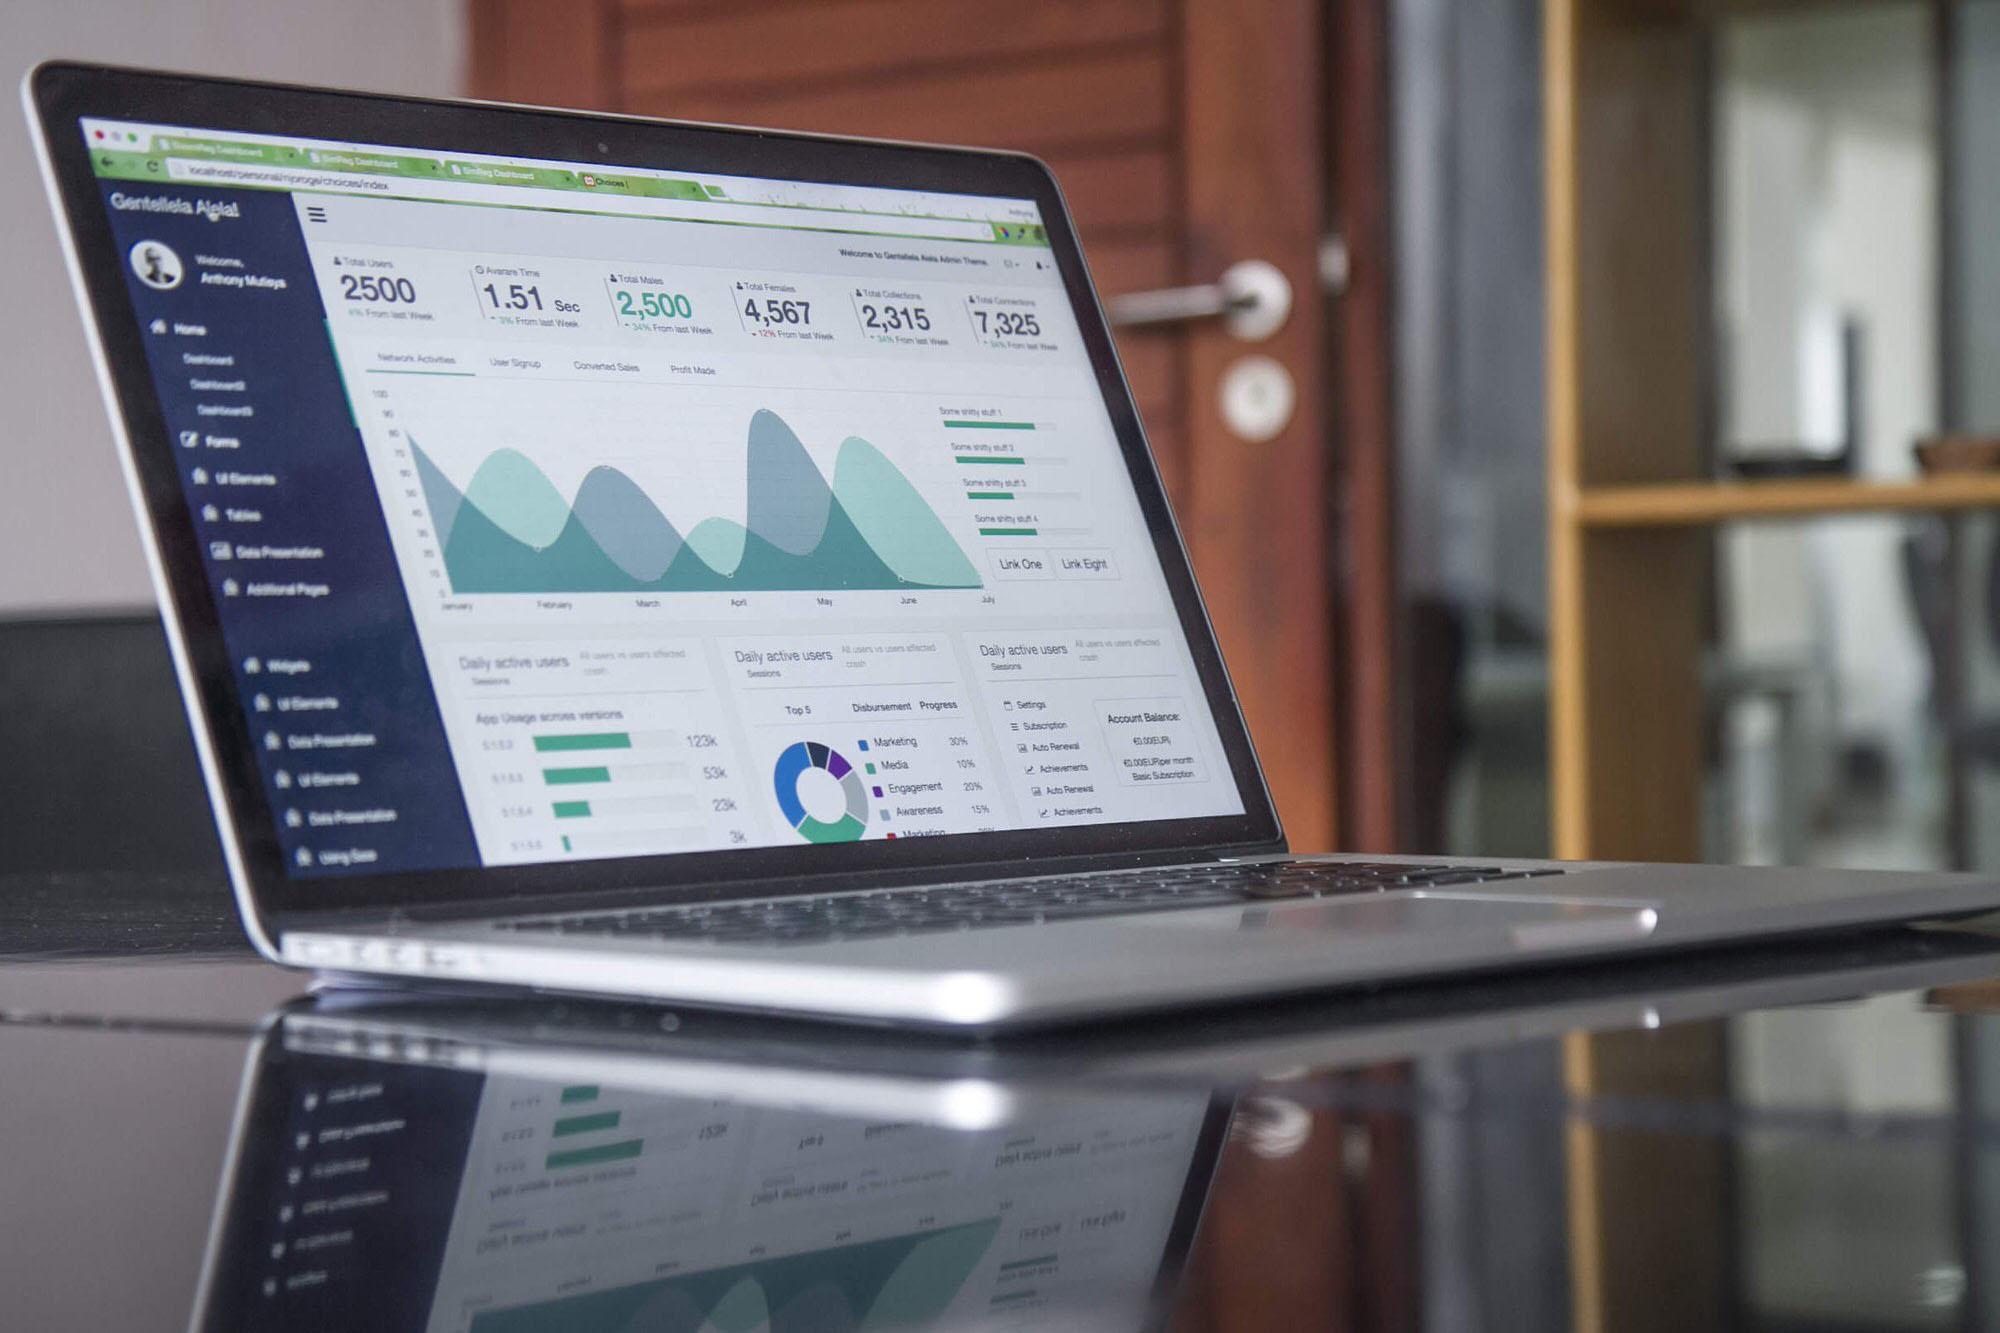 Open laptop with spreadsheet data on screen